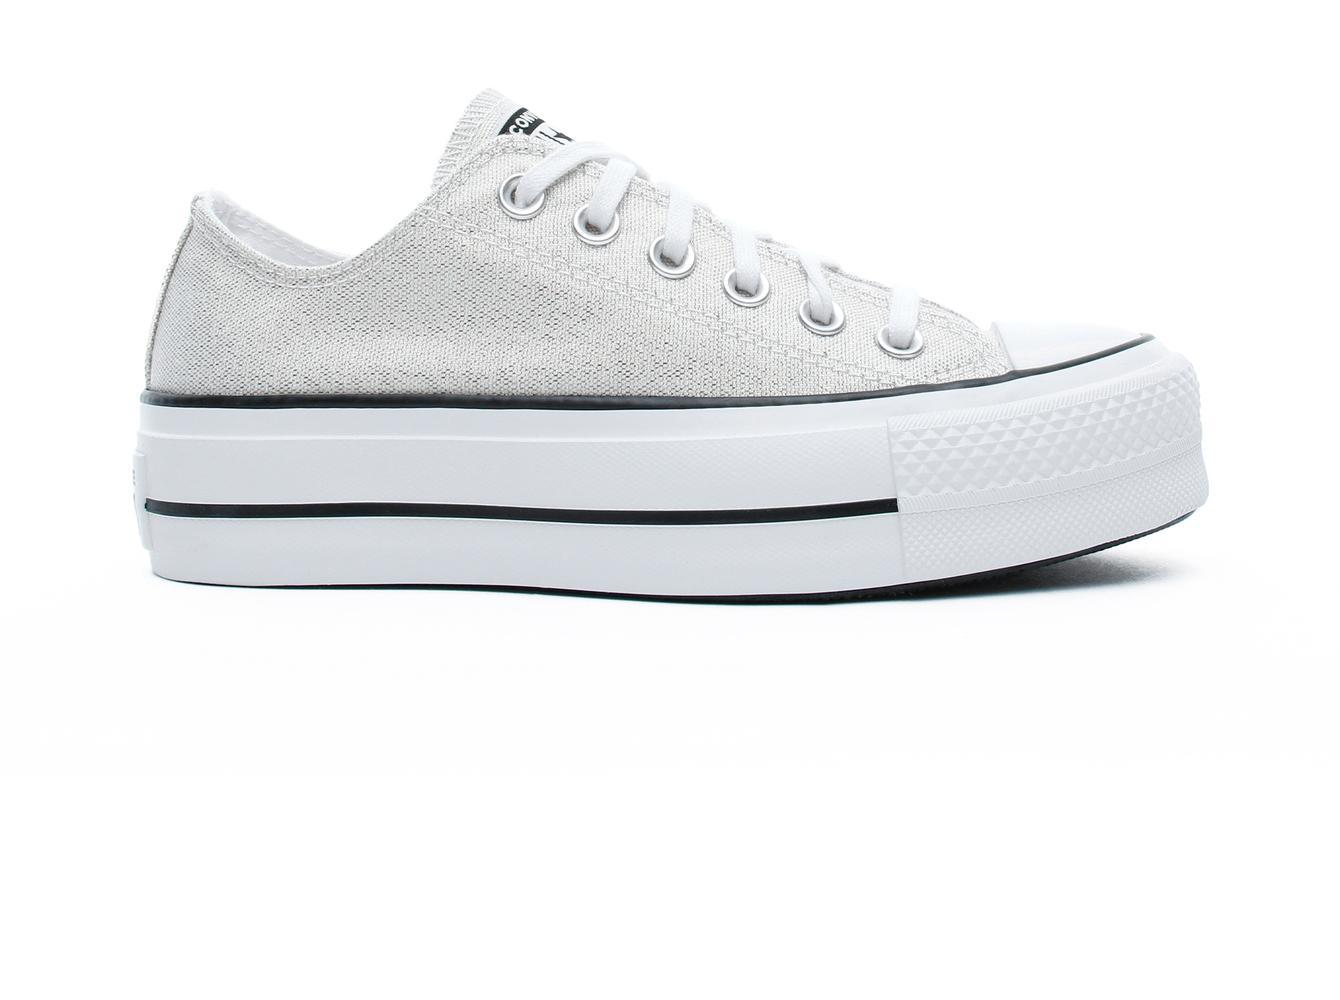 Chuck Taylor All Star Lift Ox Kadın Gri Sneaker